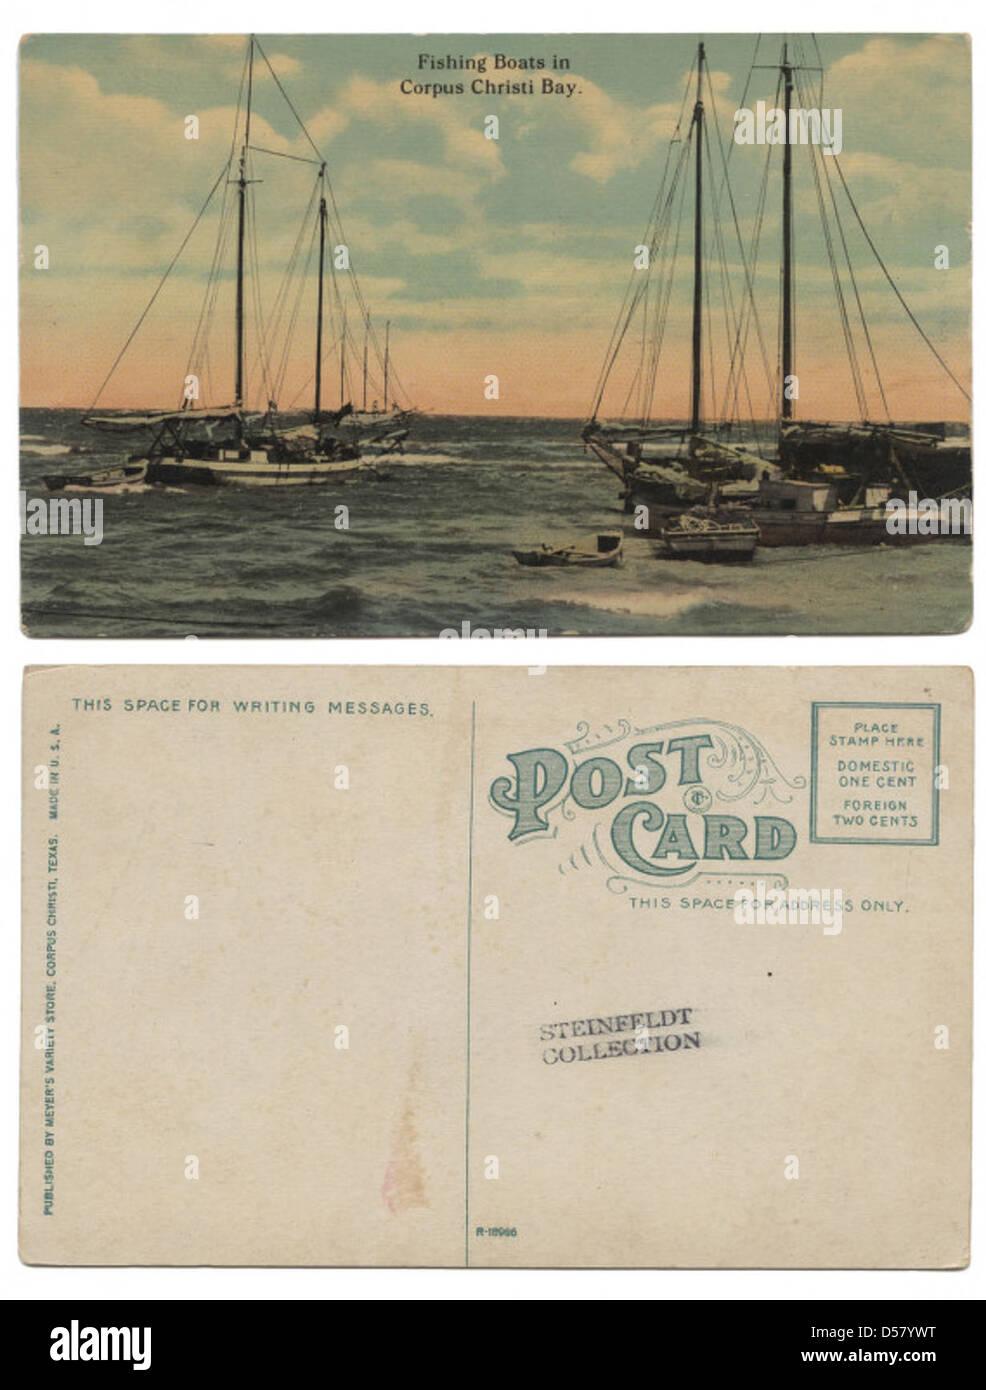 Fishing Boats in Corpus Christi Bay. - Stock Image